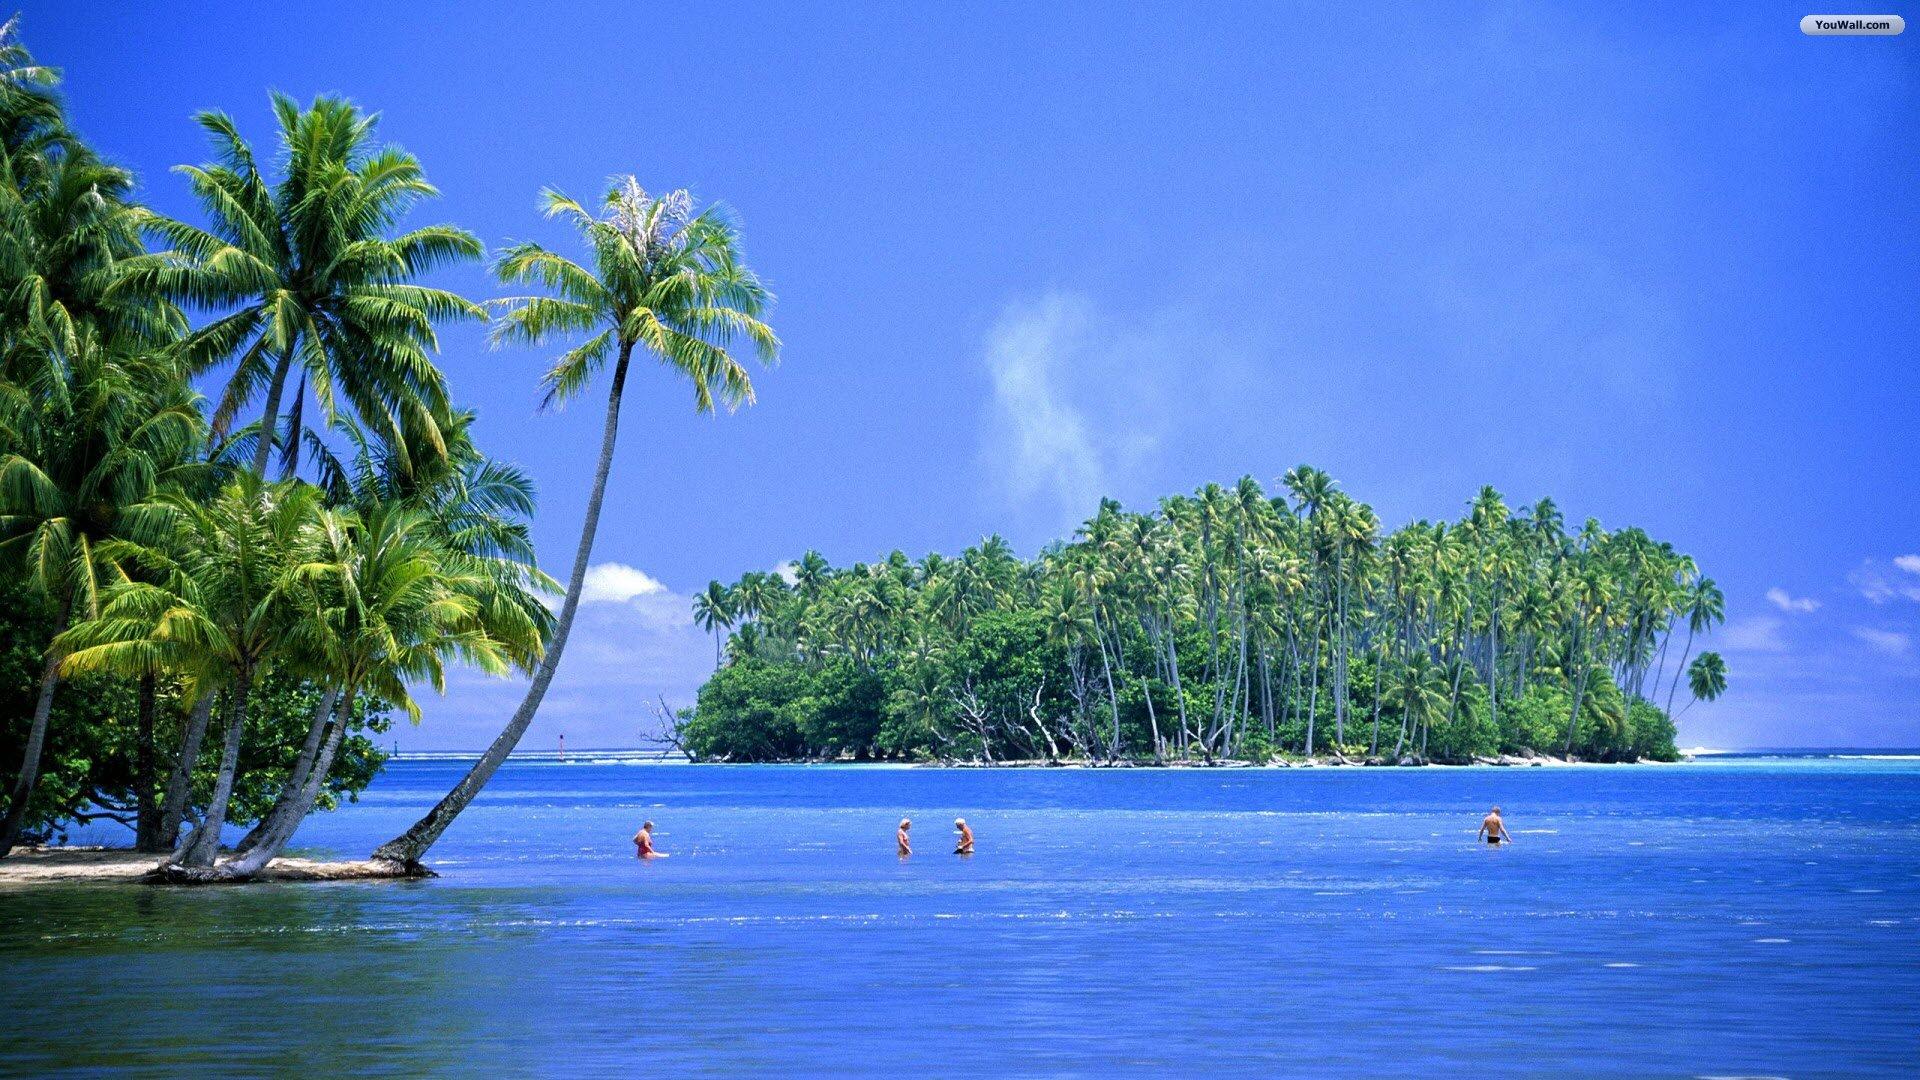 youwall tahiti blue sea wallpaper wallpaper,wallpapers,free 1920x1080